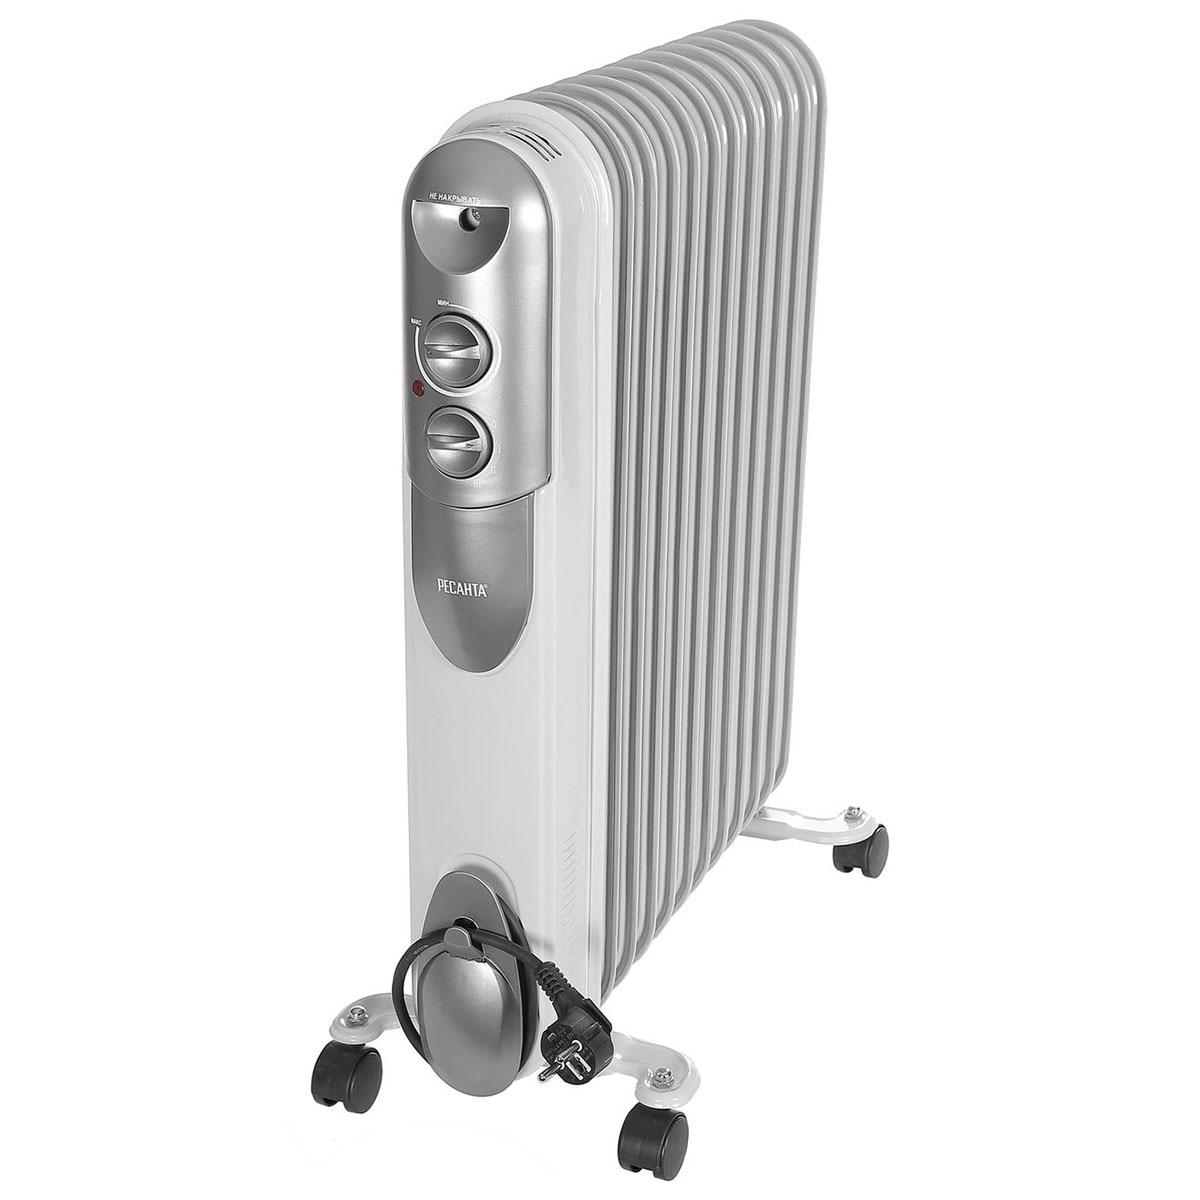 Heater Oil Resanta ОМПТ-12Н (Power 2500 W, 12 sections, adjustment heating) heater oil resanta омпт 7н power 1500 w 7 sections adjustment heating